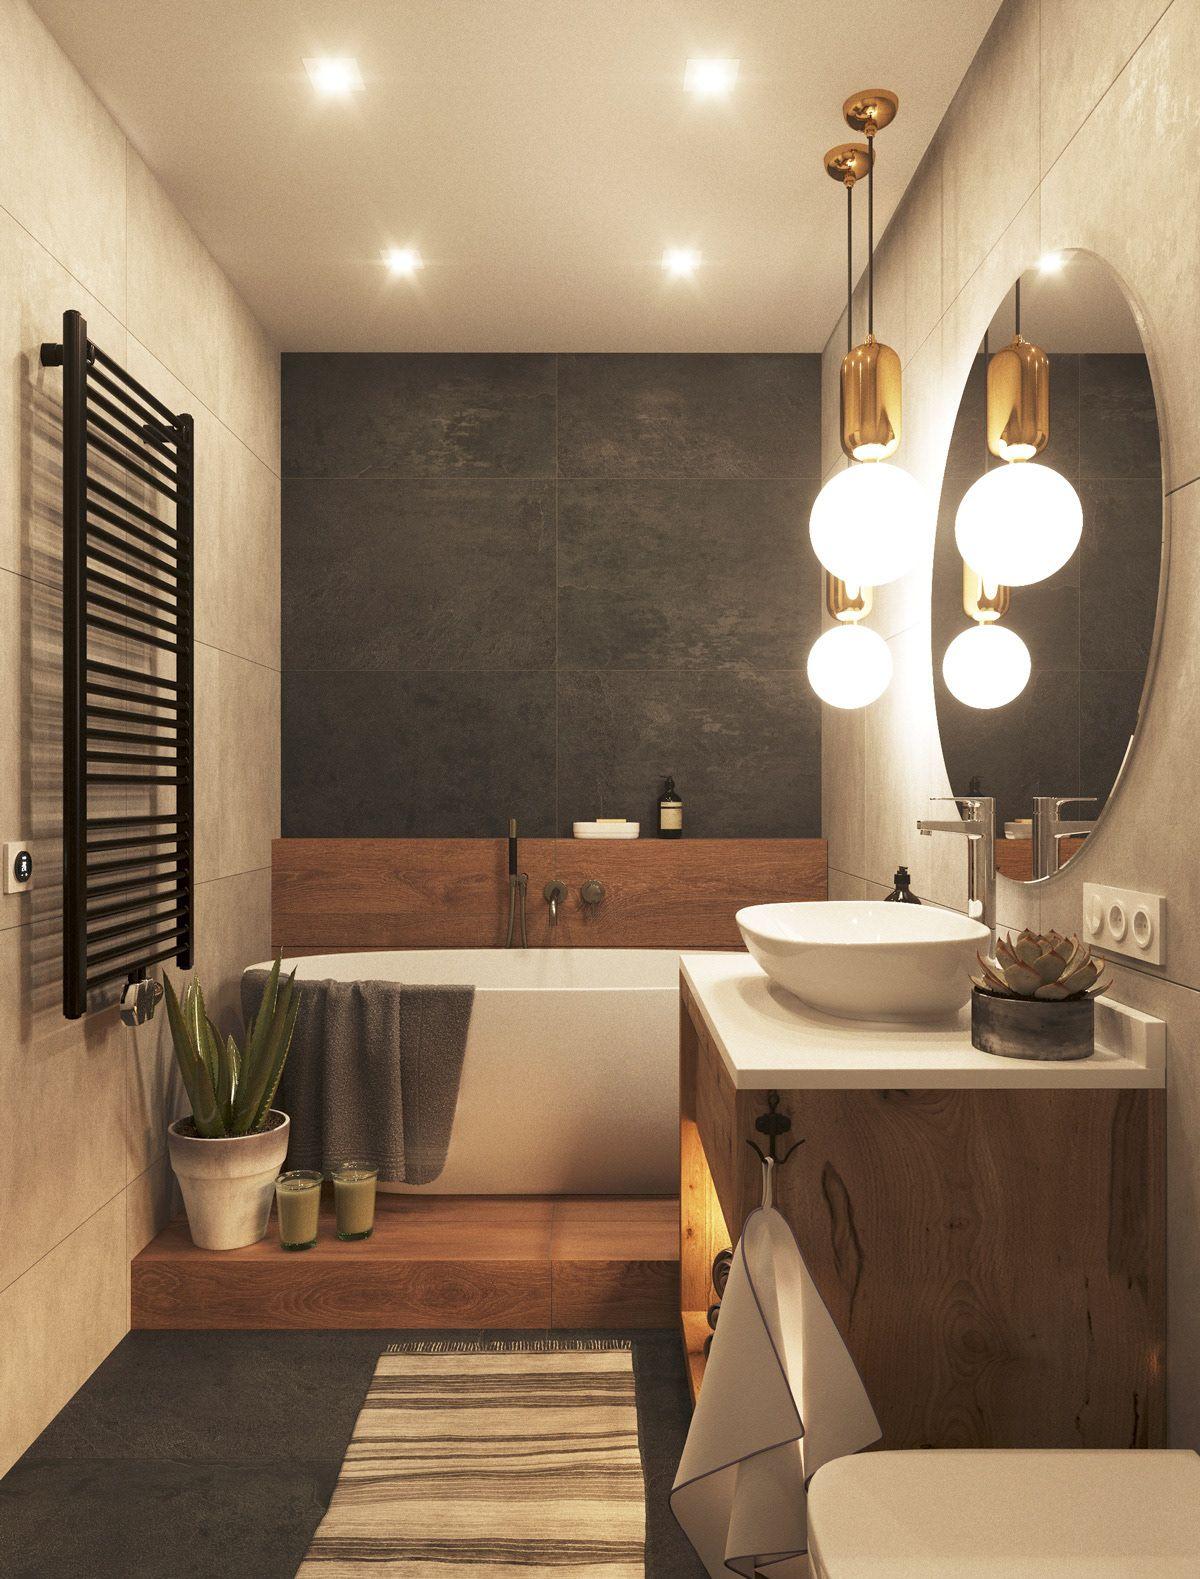 Vinyl home also best decor images in rh pinterest